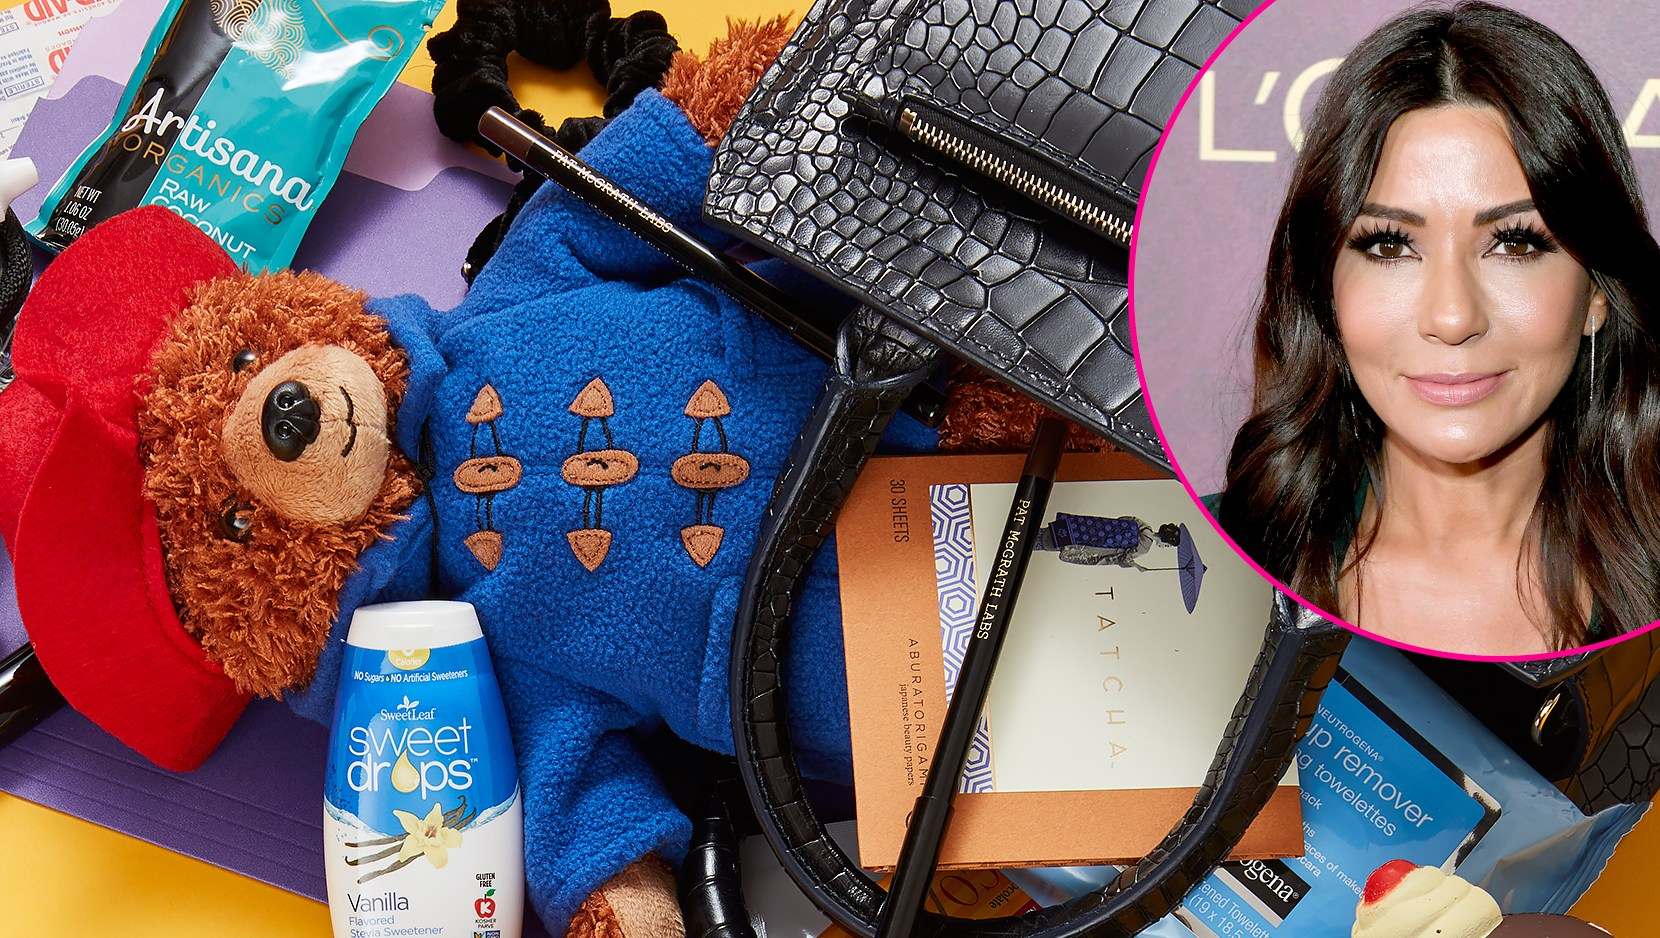 Marisol-Nichols-bag-promo